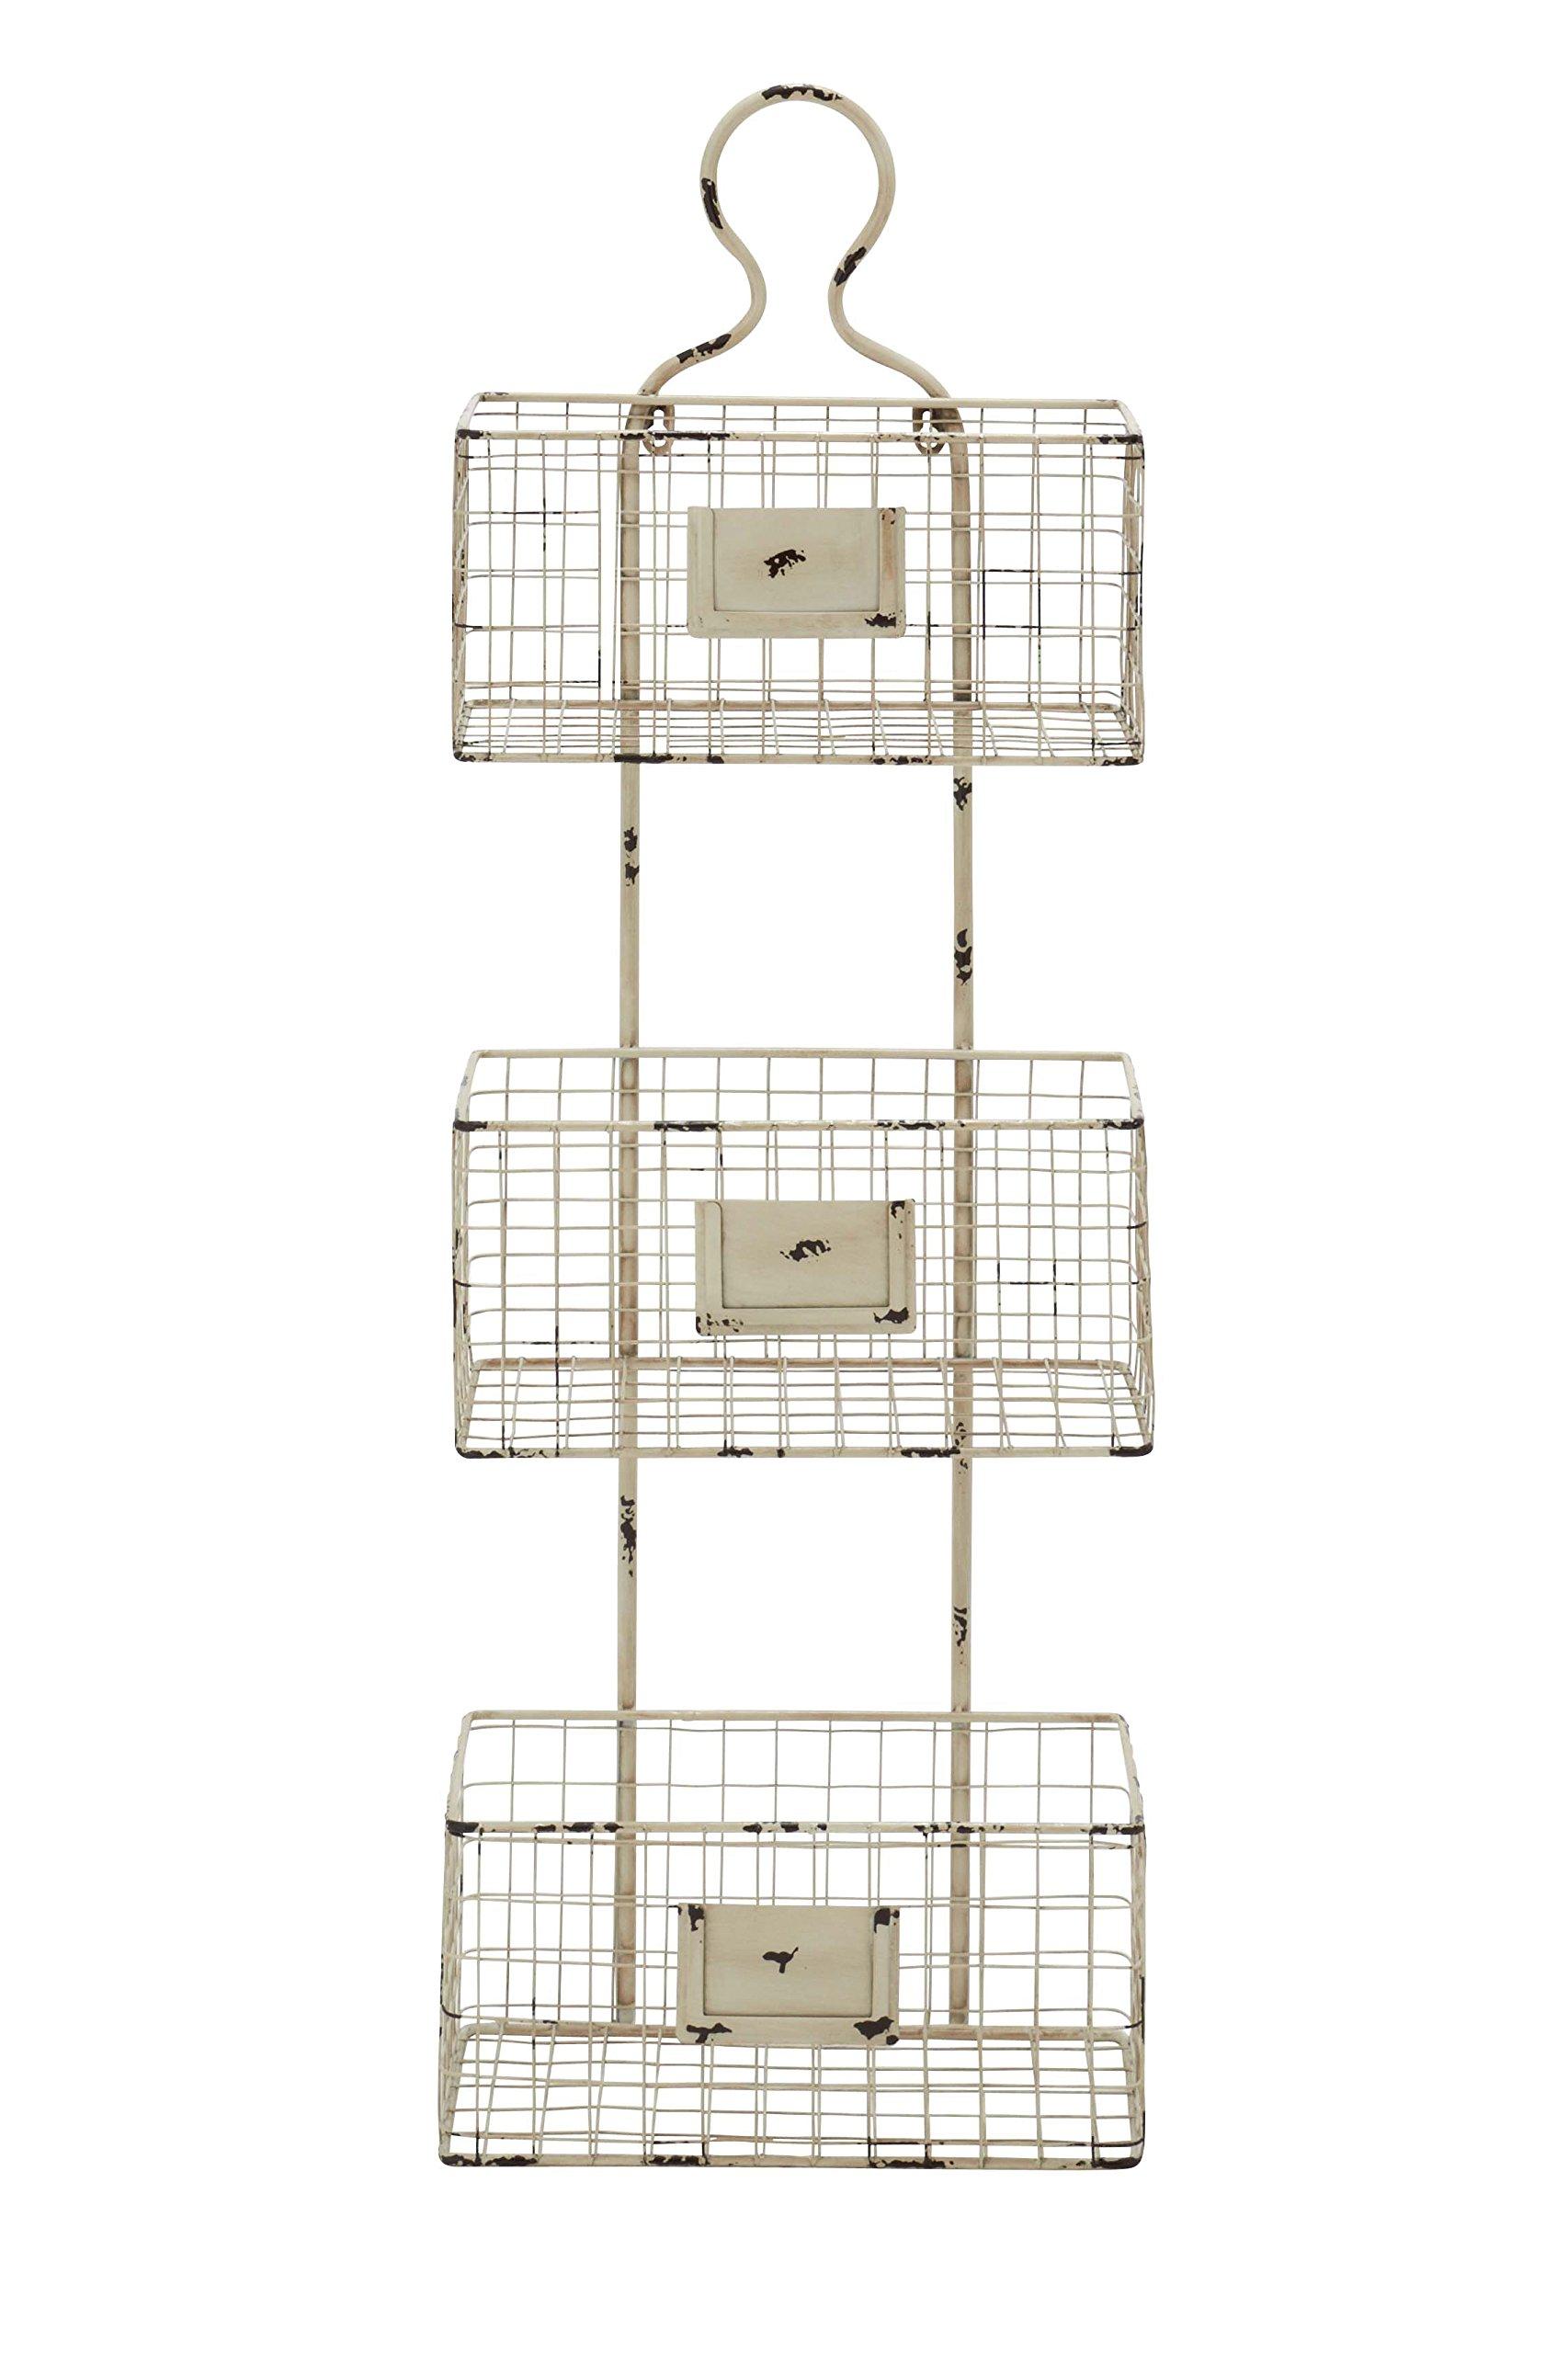 Deco 79 Metal Basket Shelf, 13 by 37-Inch by Deco 79 (Image #1)